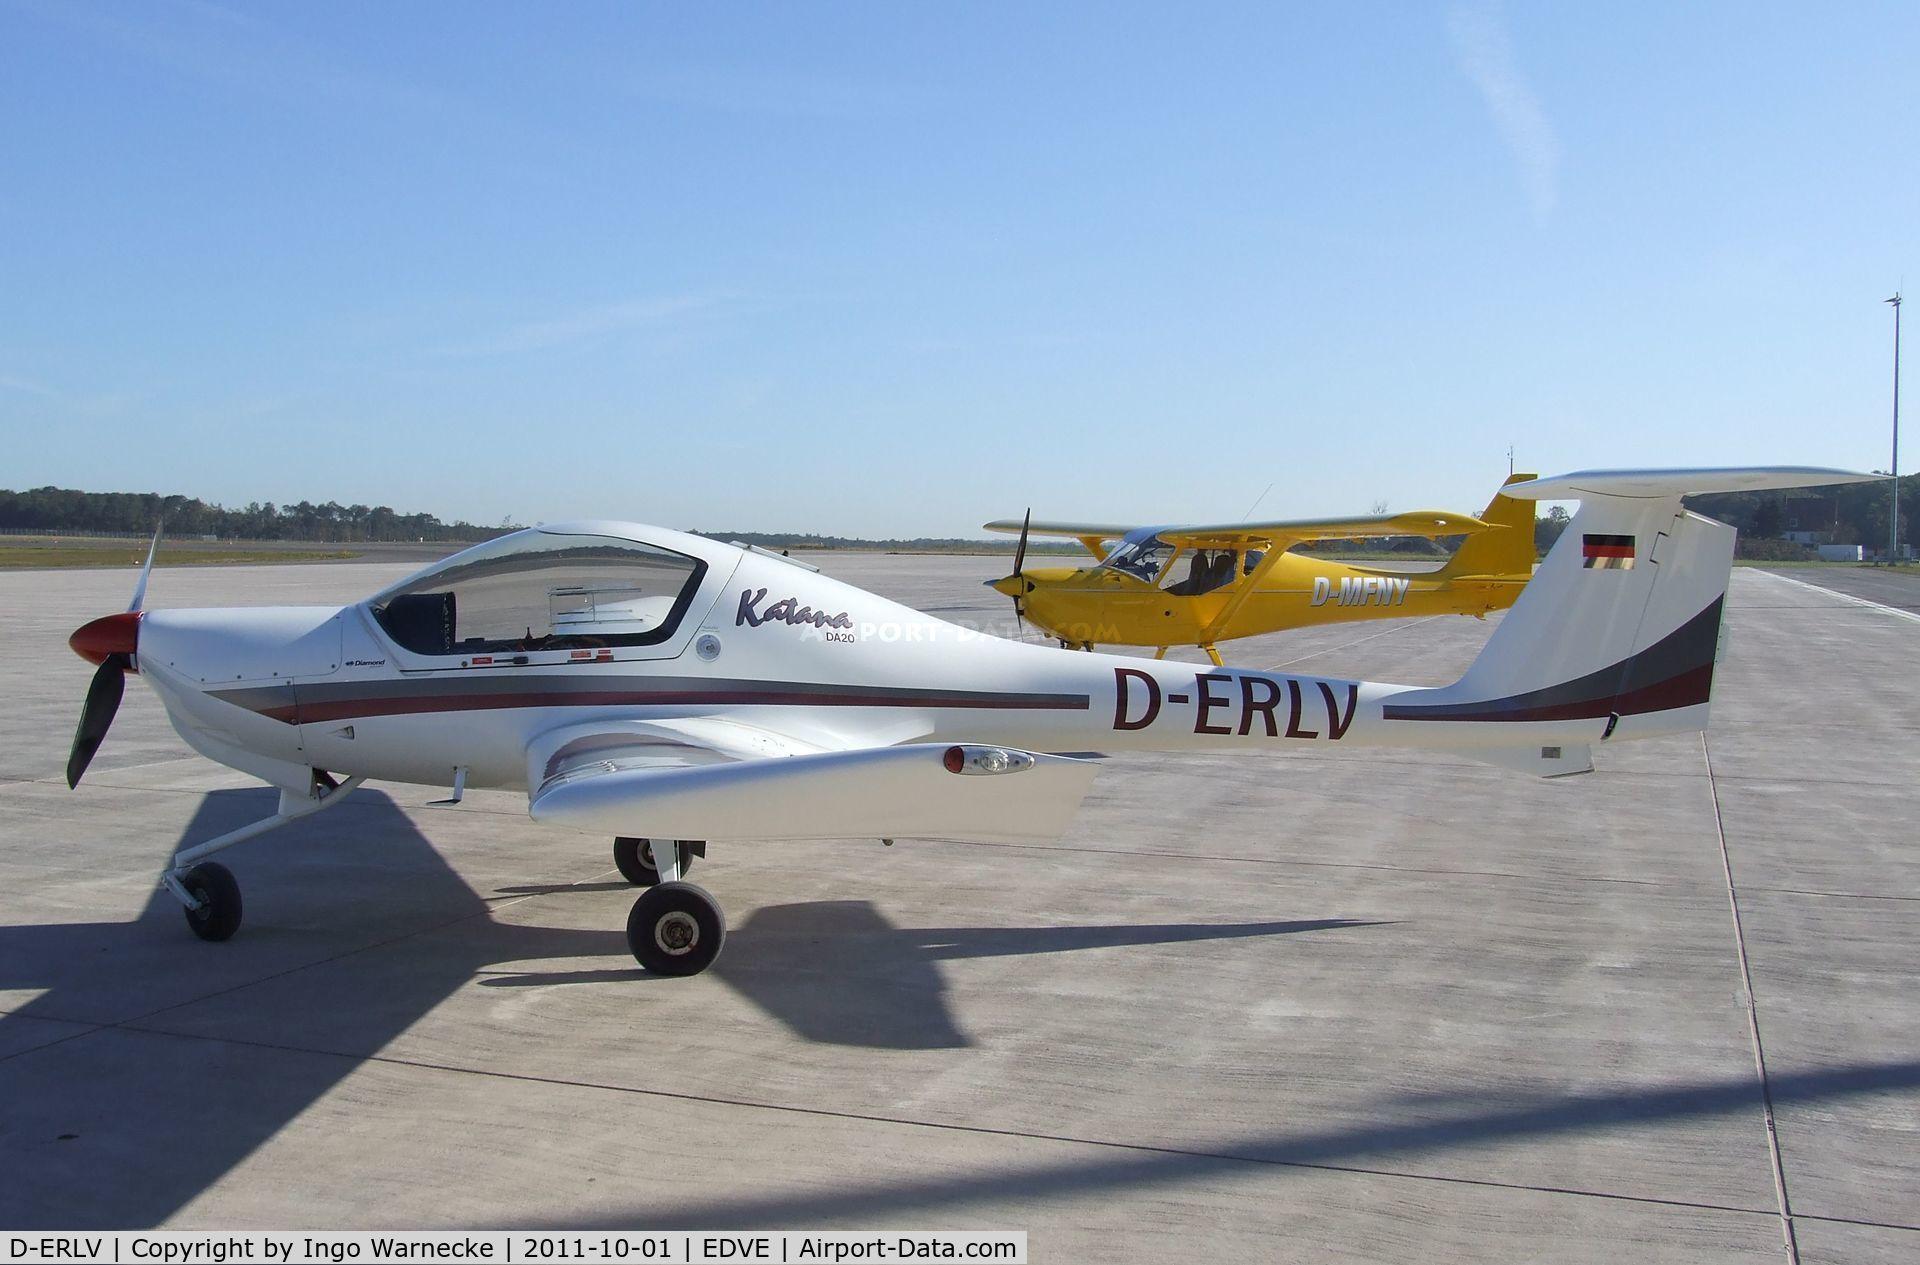 D-ERLV, 1998 Diamond DA-20A-1 Katana C/N 10318, Diamond DA-20-A1 Katana at Braunschweig-Waggum airport